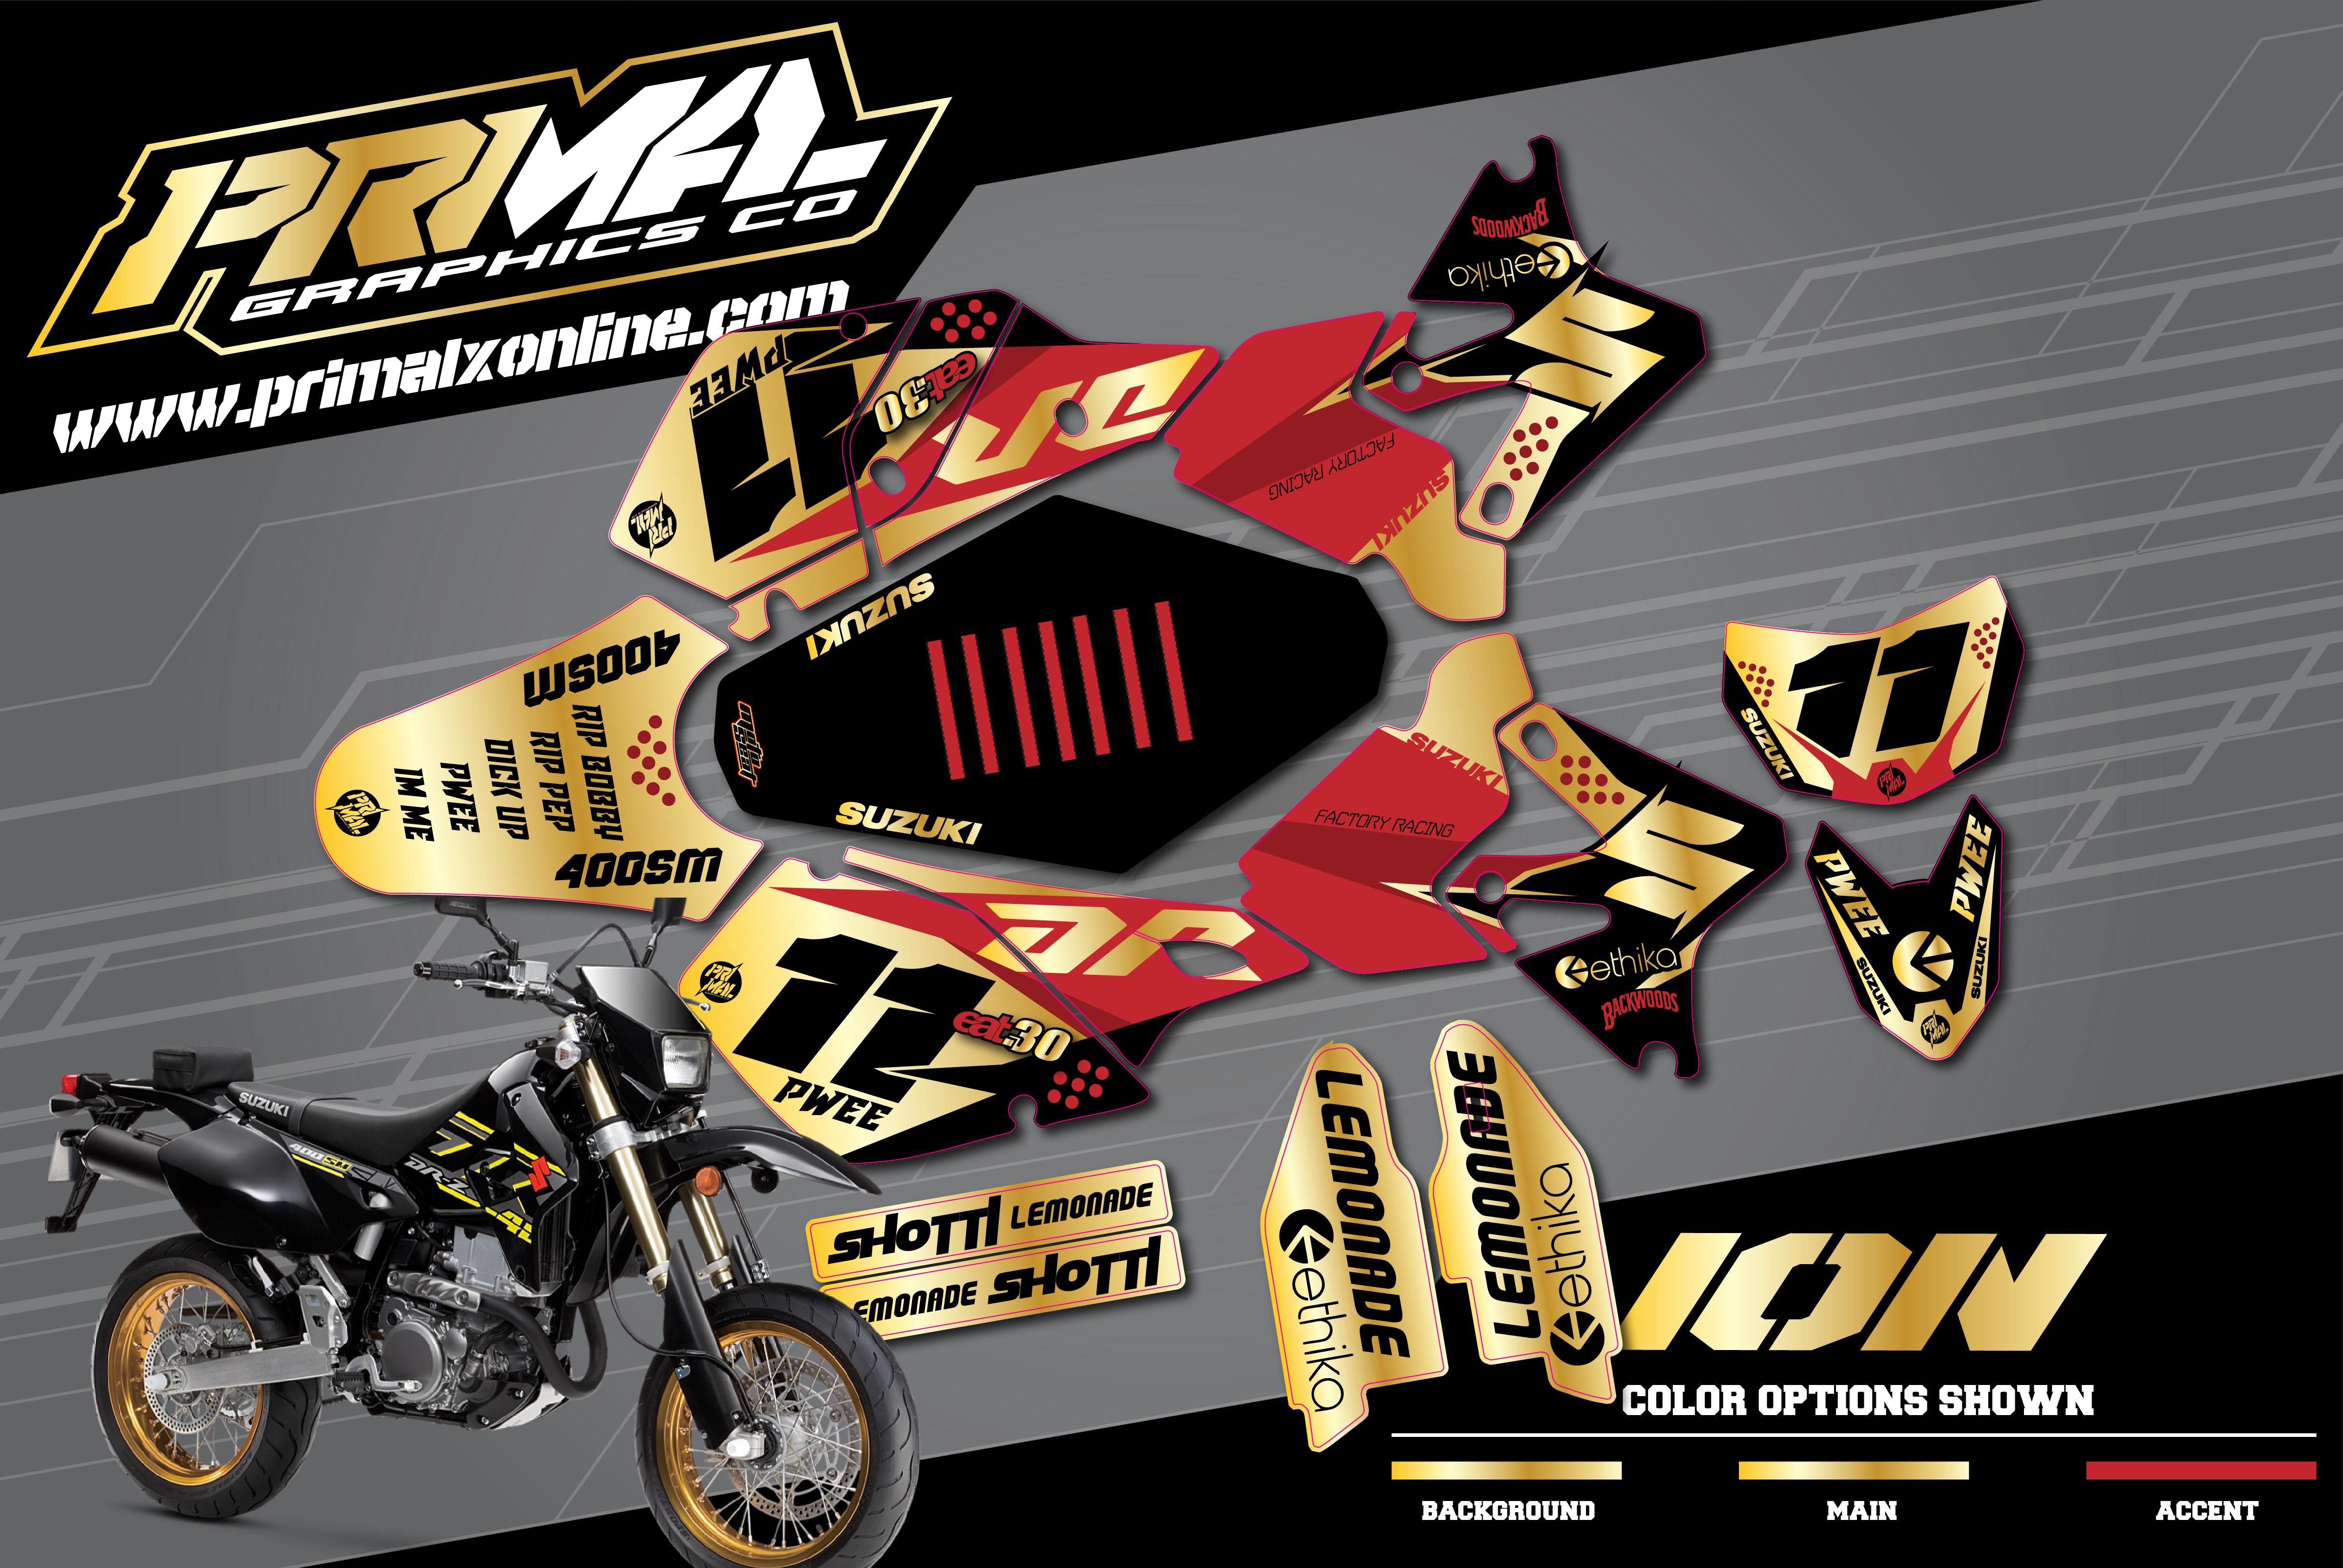 PRIMAL-X-MOTORSPORTS-PRIMAL-GRAPHICS-CO-SUZUKI-DRZ400SM-SUPERMOTO-MOTOCROSS-GRAPHICS-BIKELIFE-CHARMCITY-NEW-ION-01